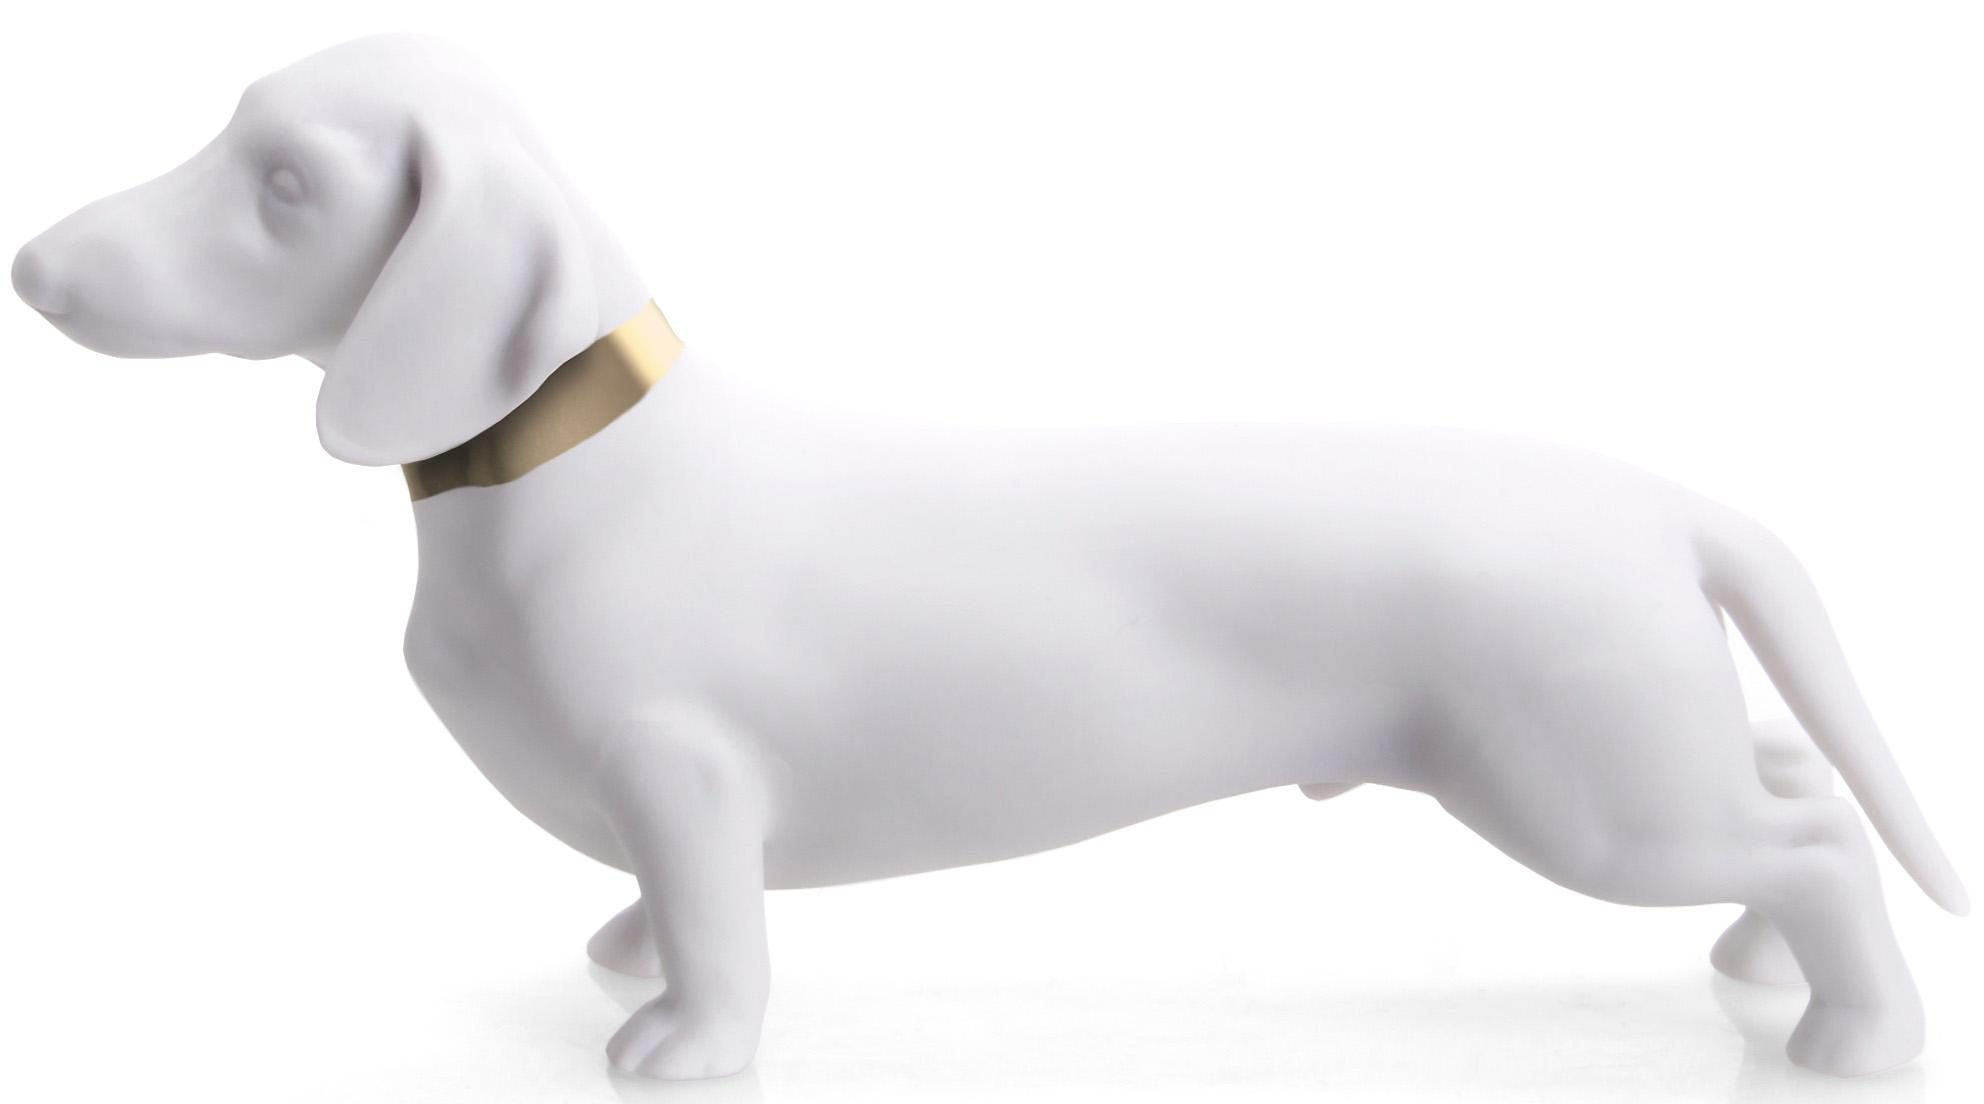 W&A Figur »Dackel« aus Porzellan